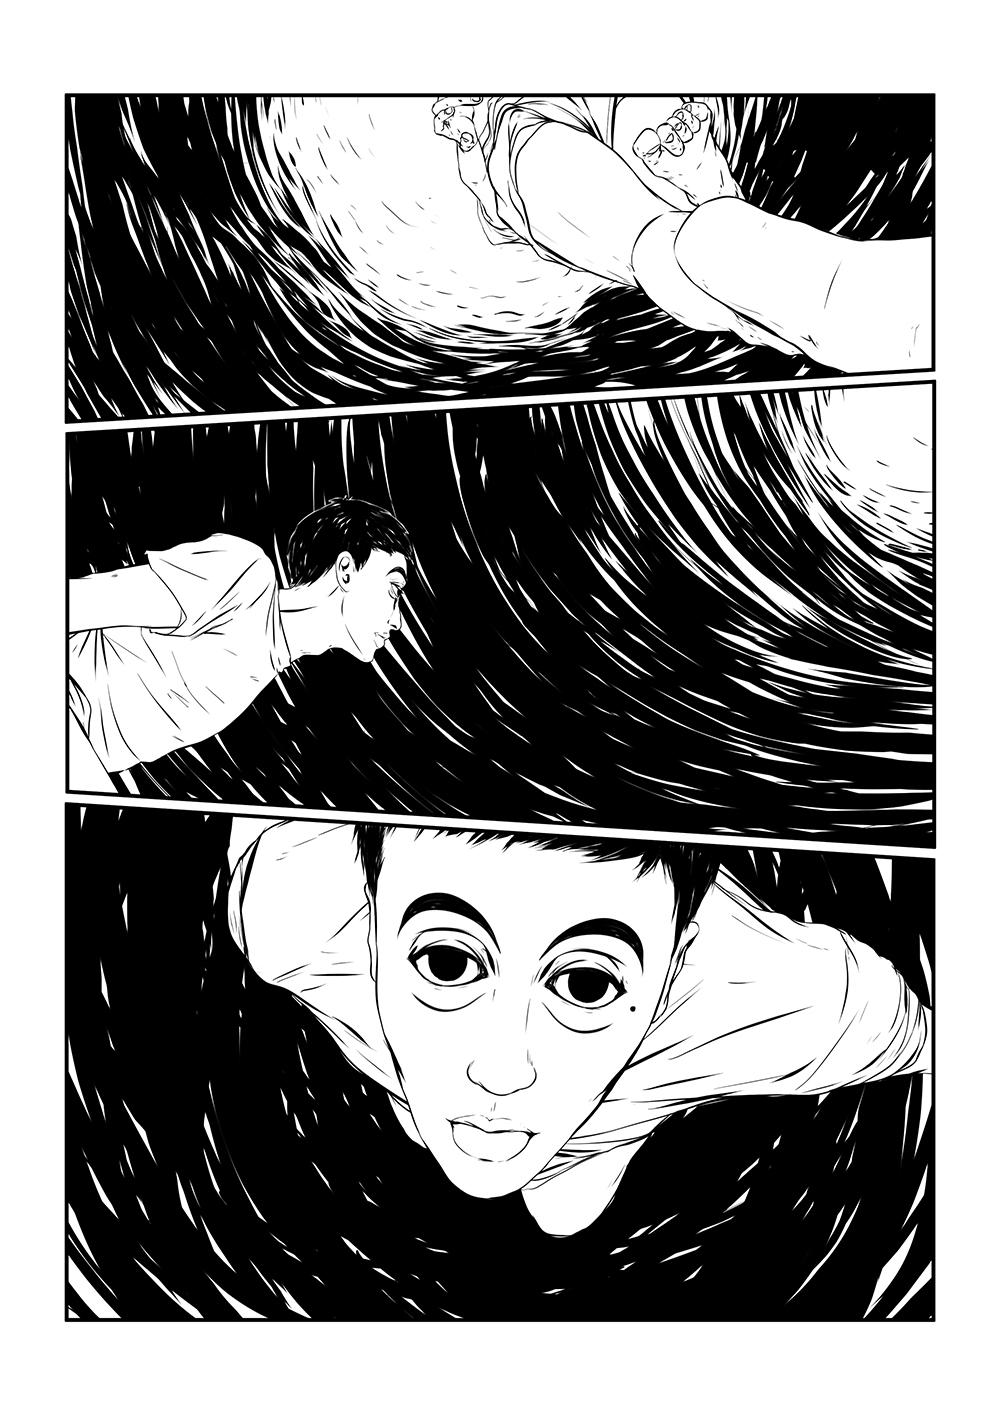 mojowang_illustration_betweenrivers_21_7.jpg